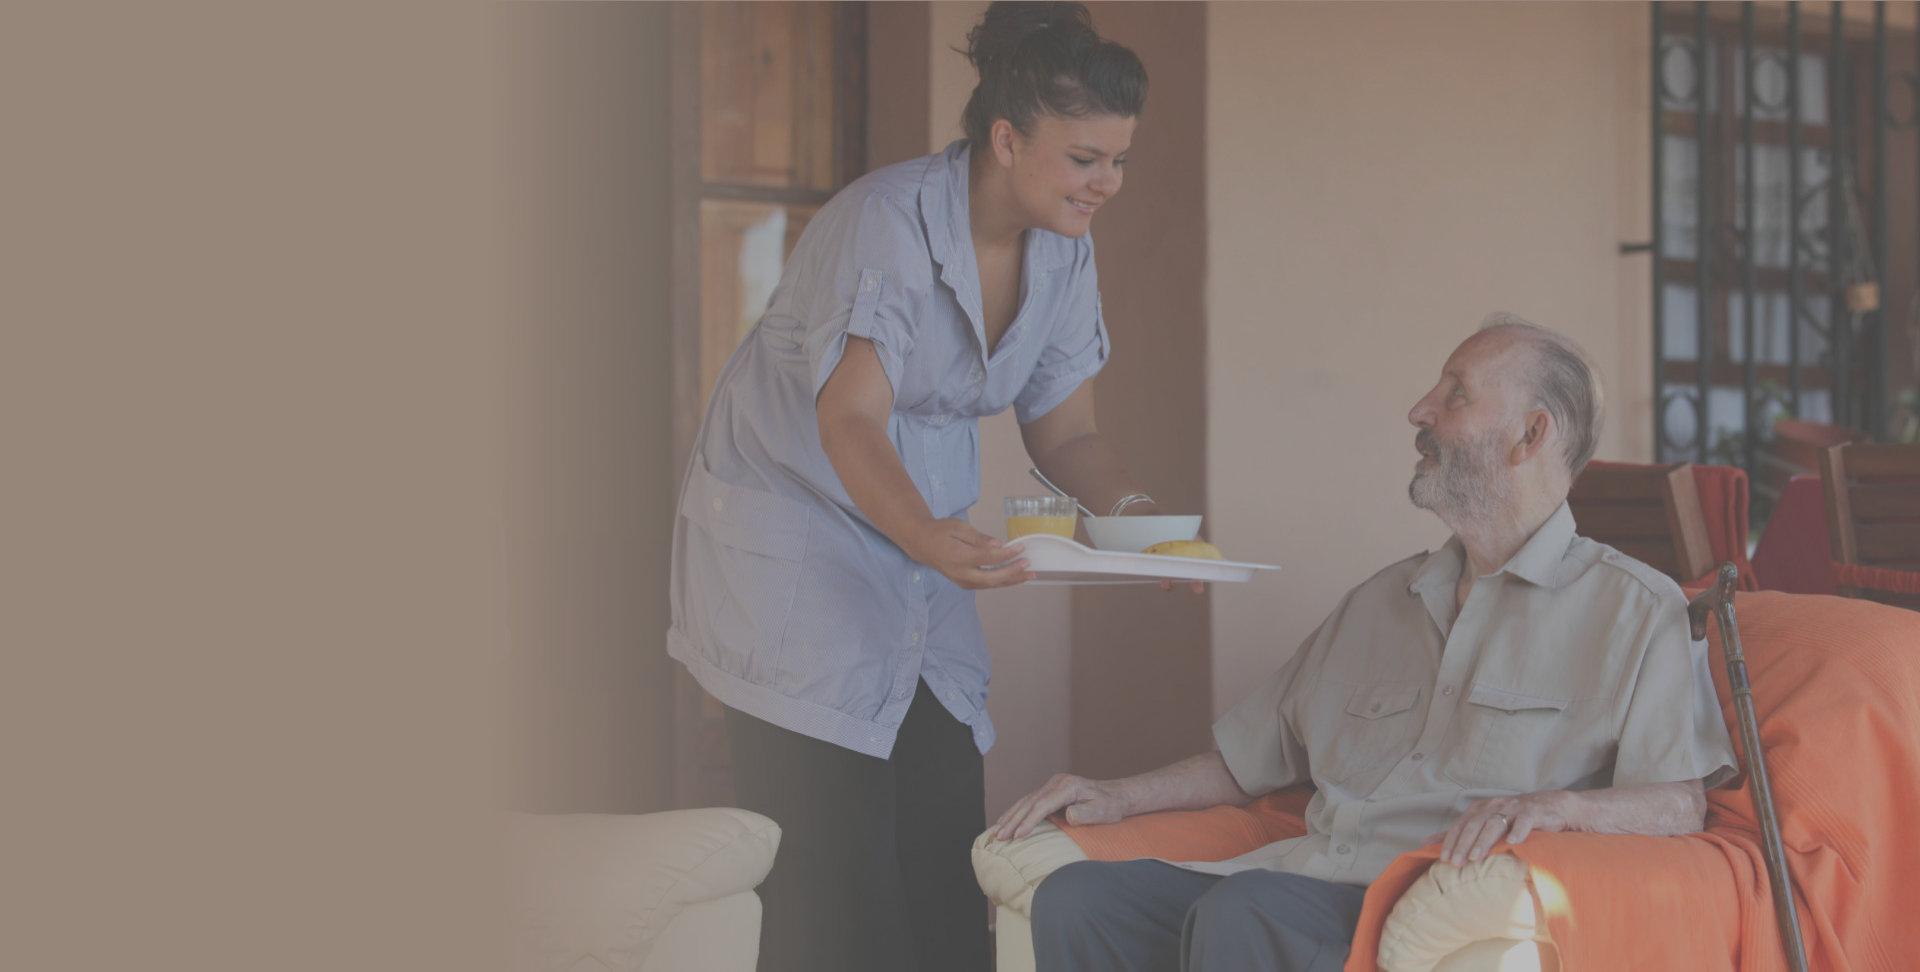 Caregiver giving food to a senior elderly